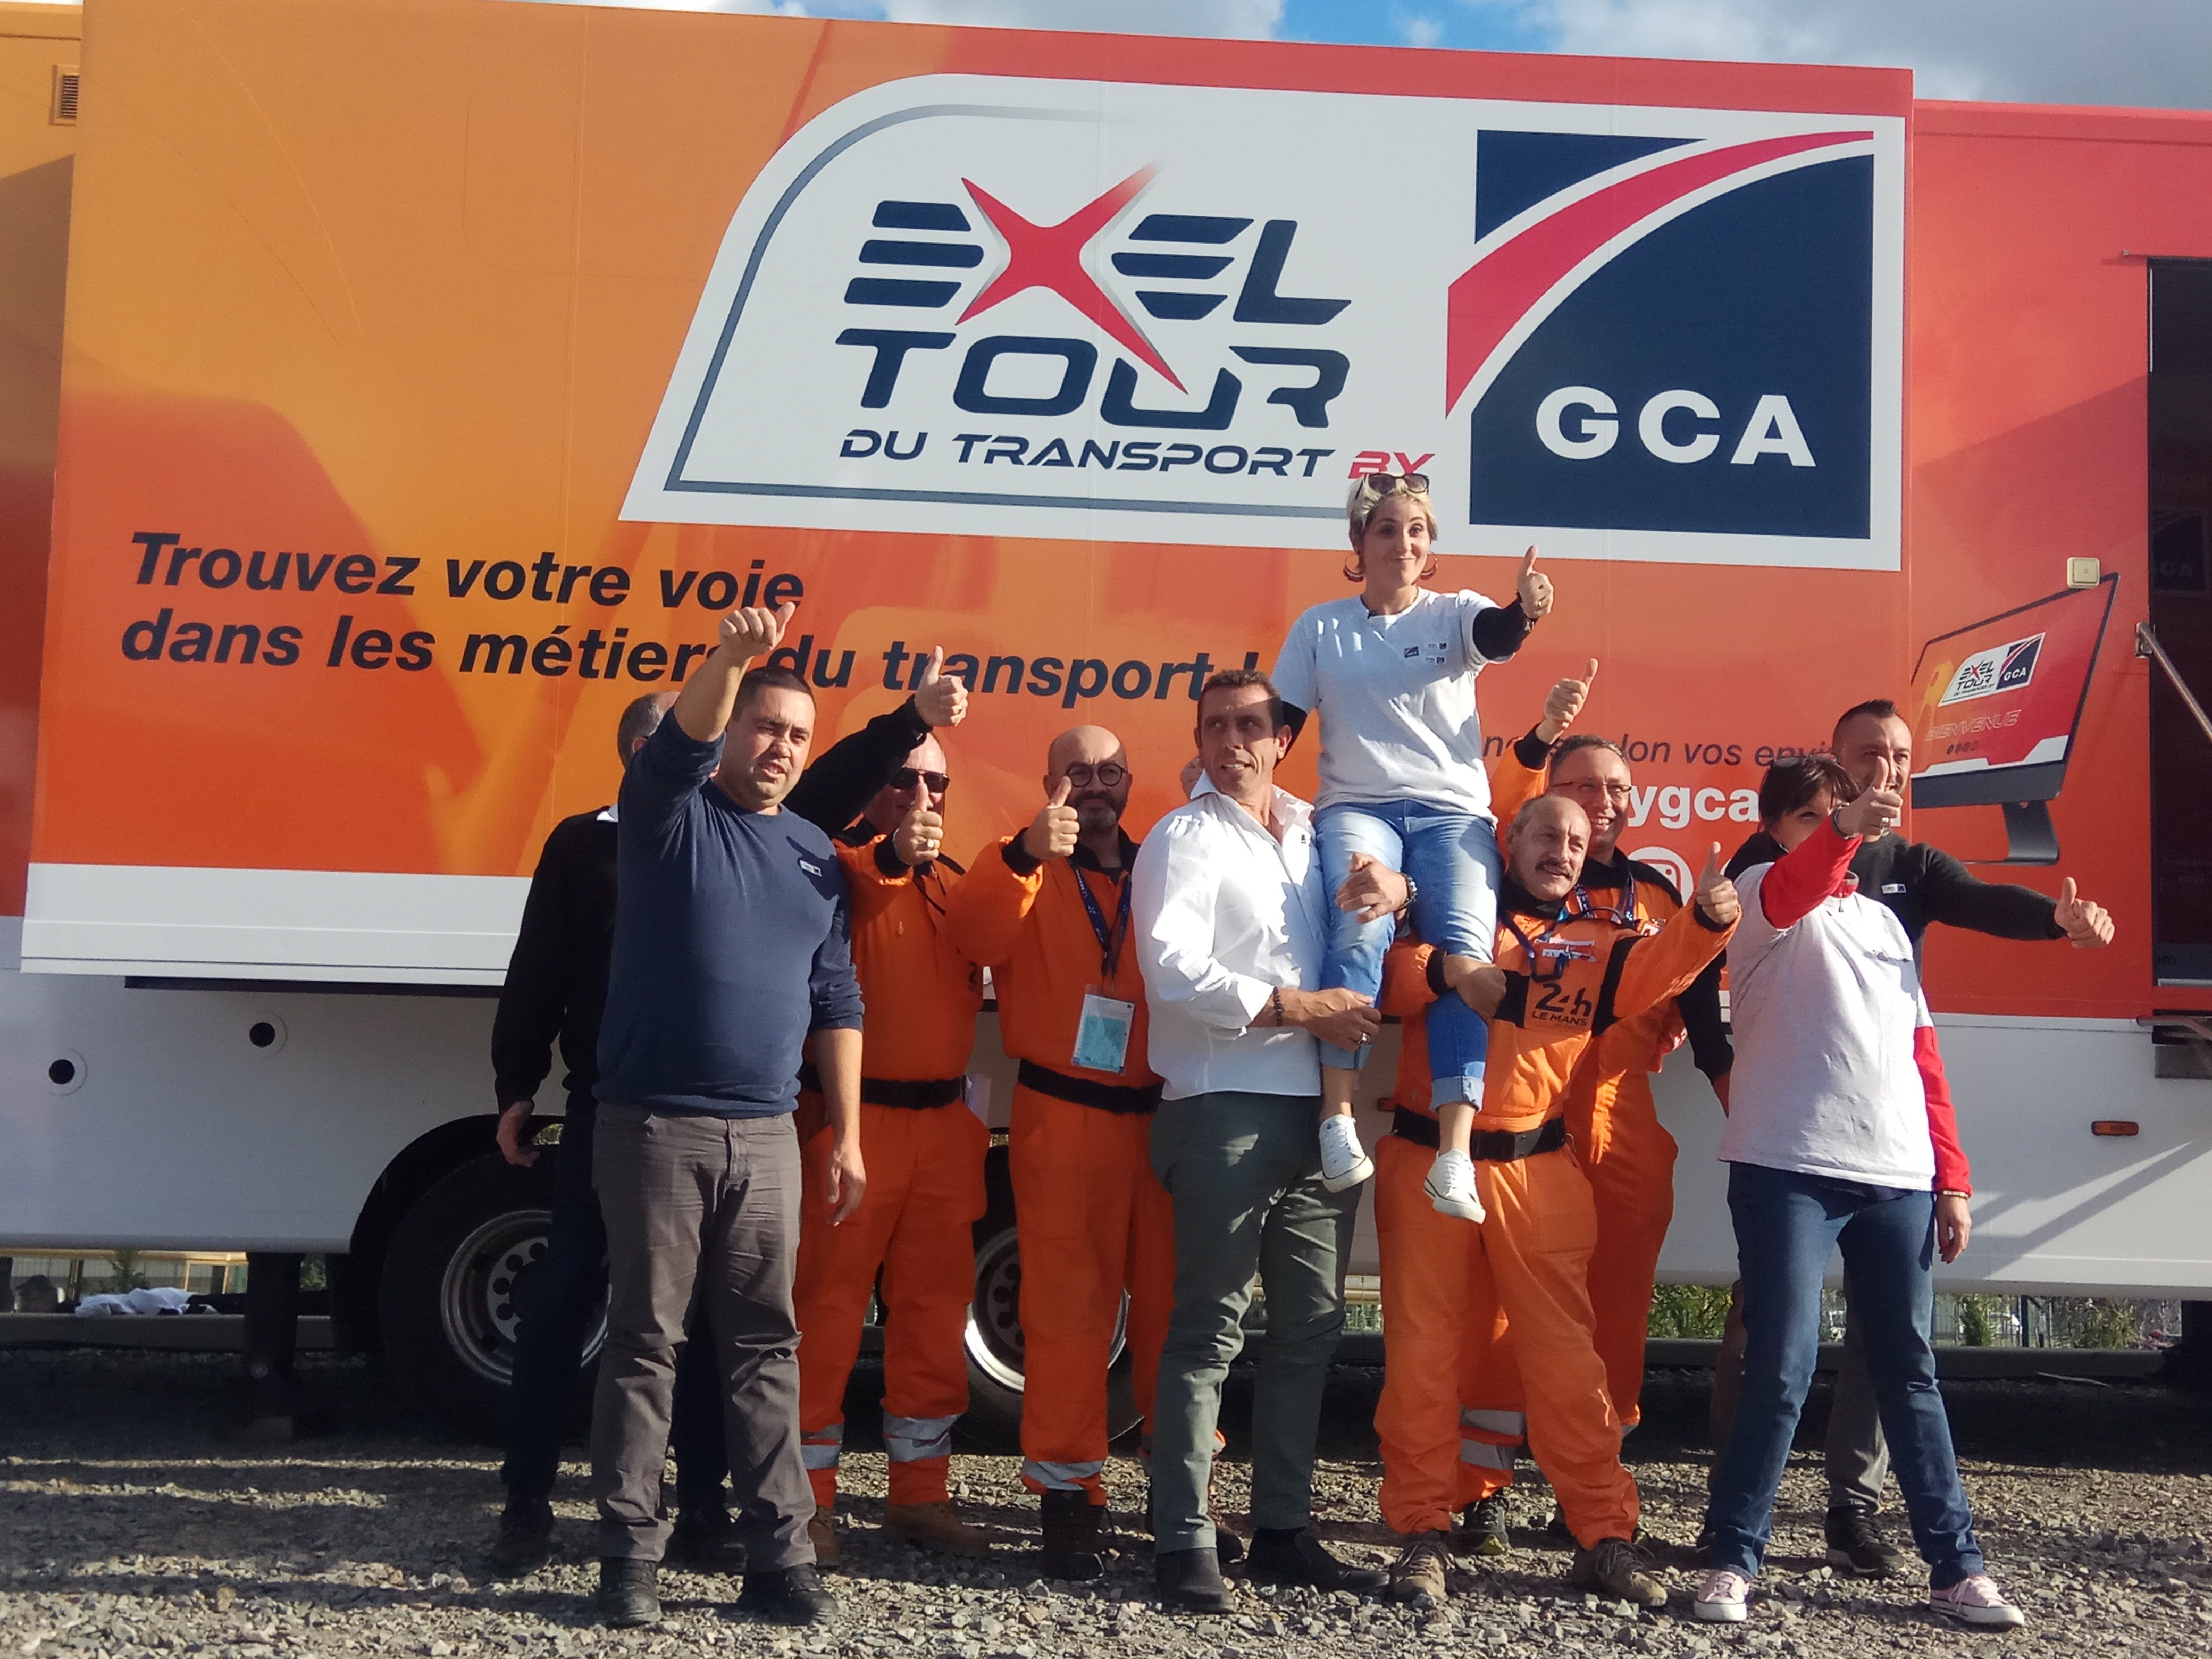 Lancement Exel Tour by GCA